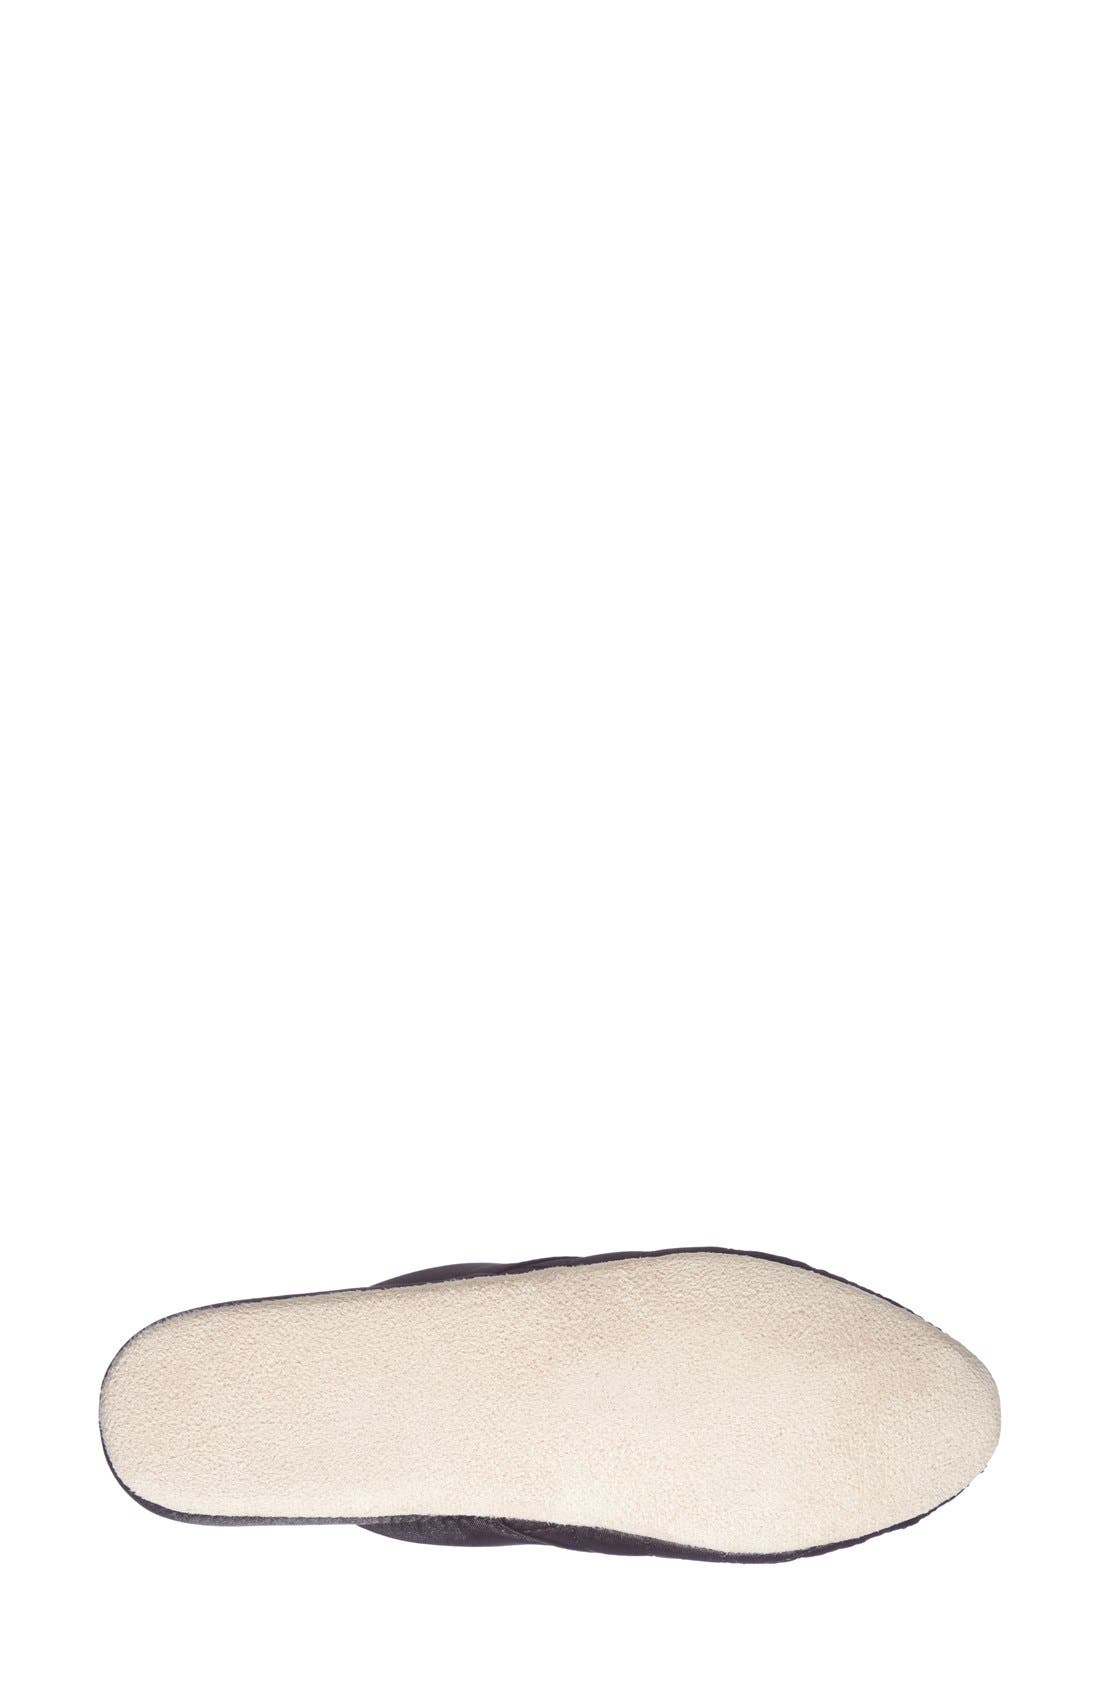 'Jackie' Slipper,                             Alternate thumbnail 4, color,                             Black/ Ivory